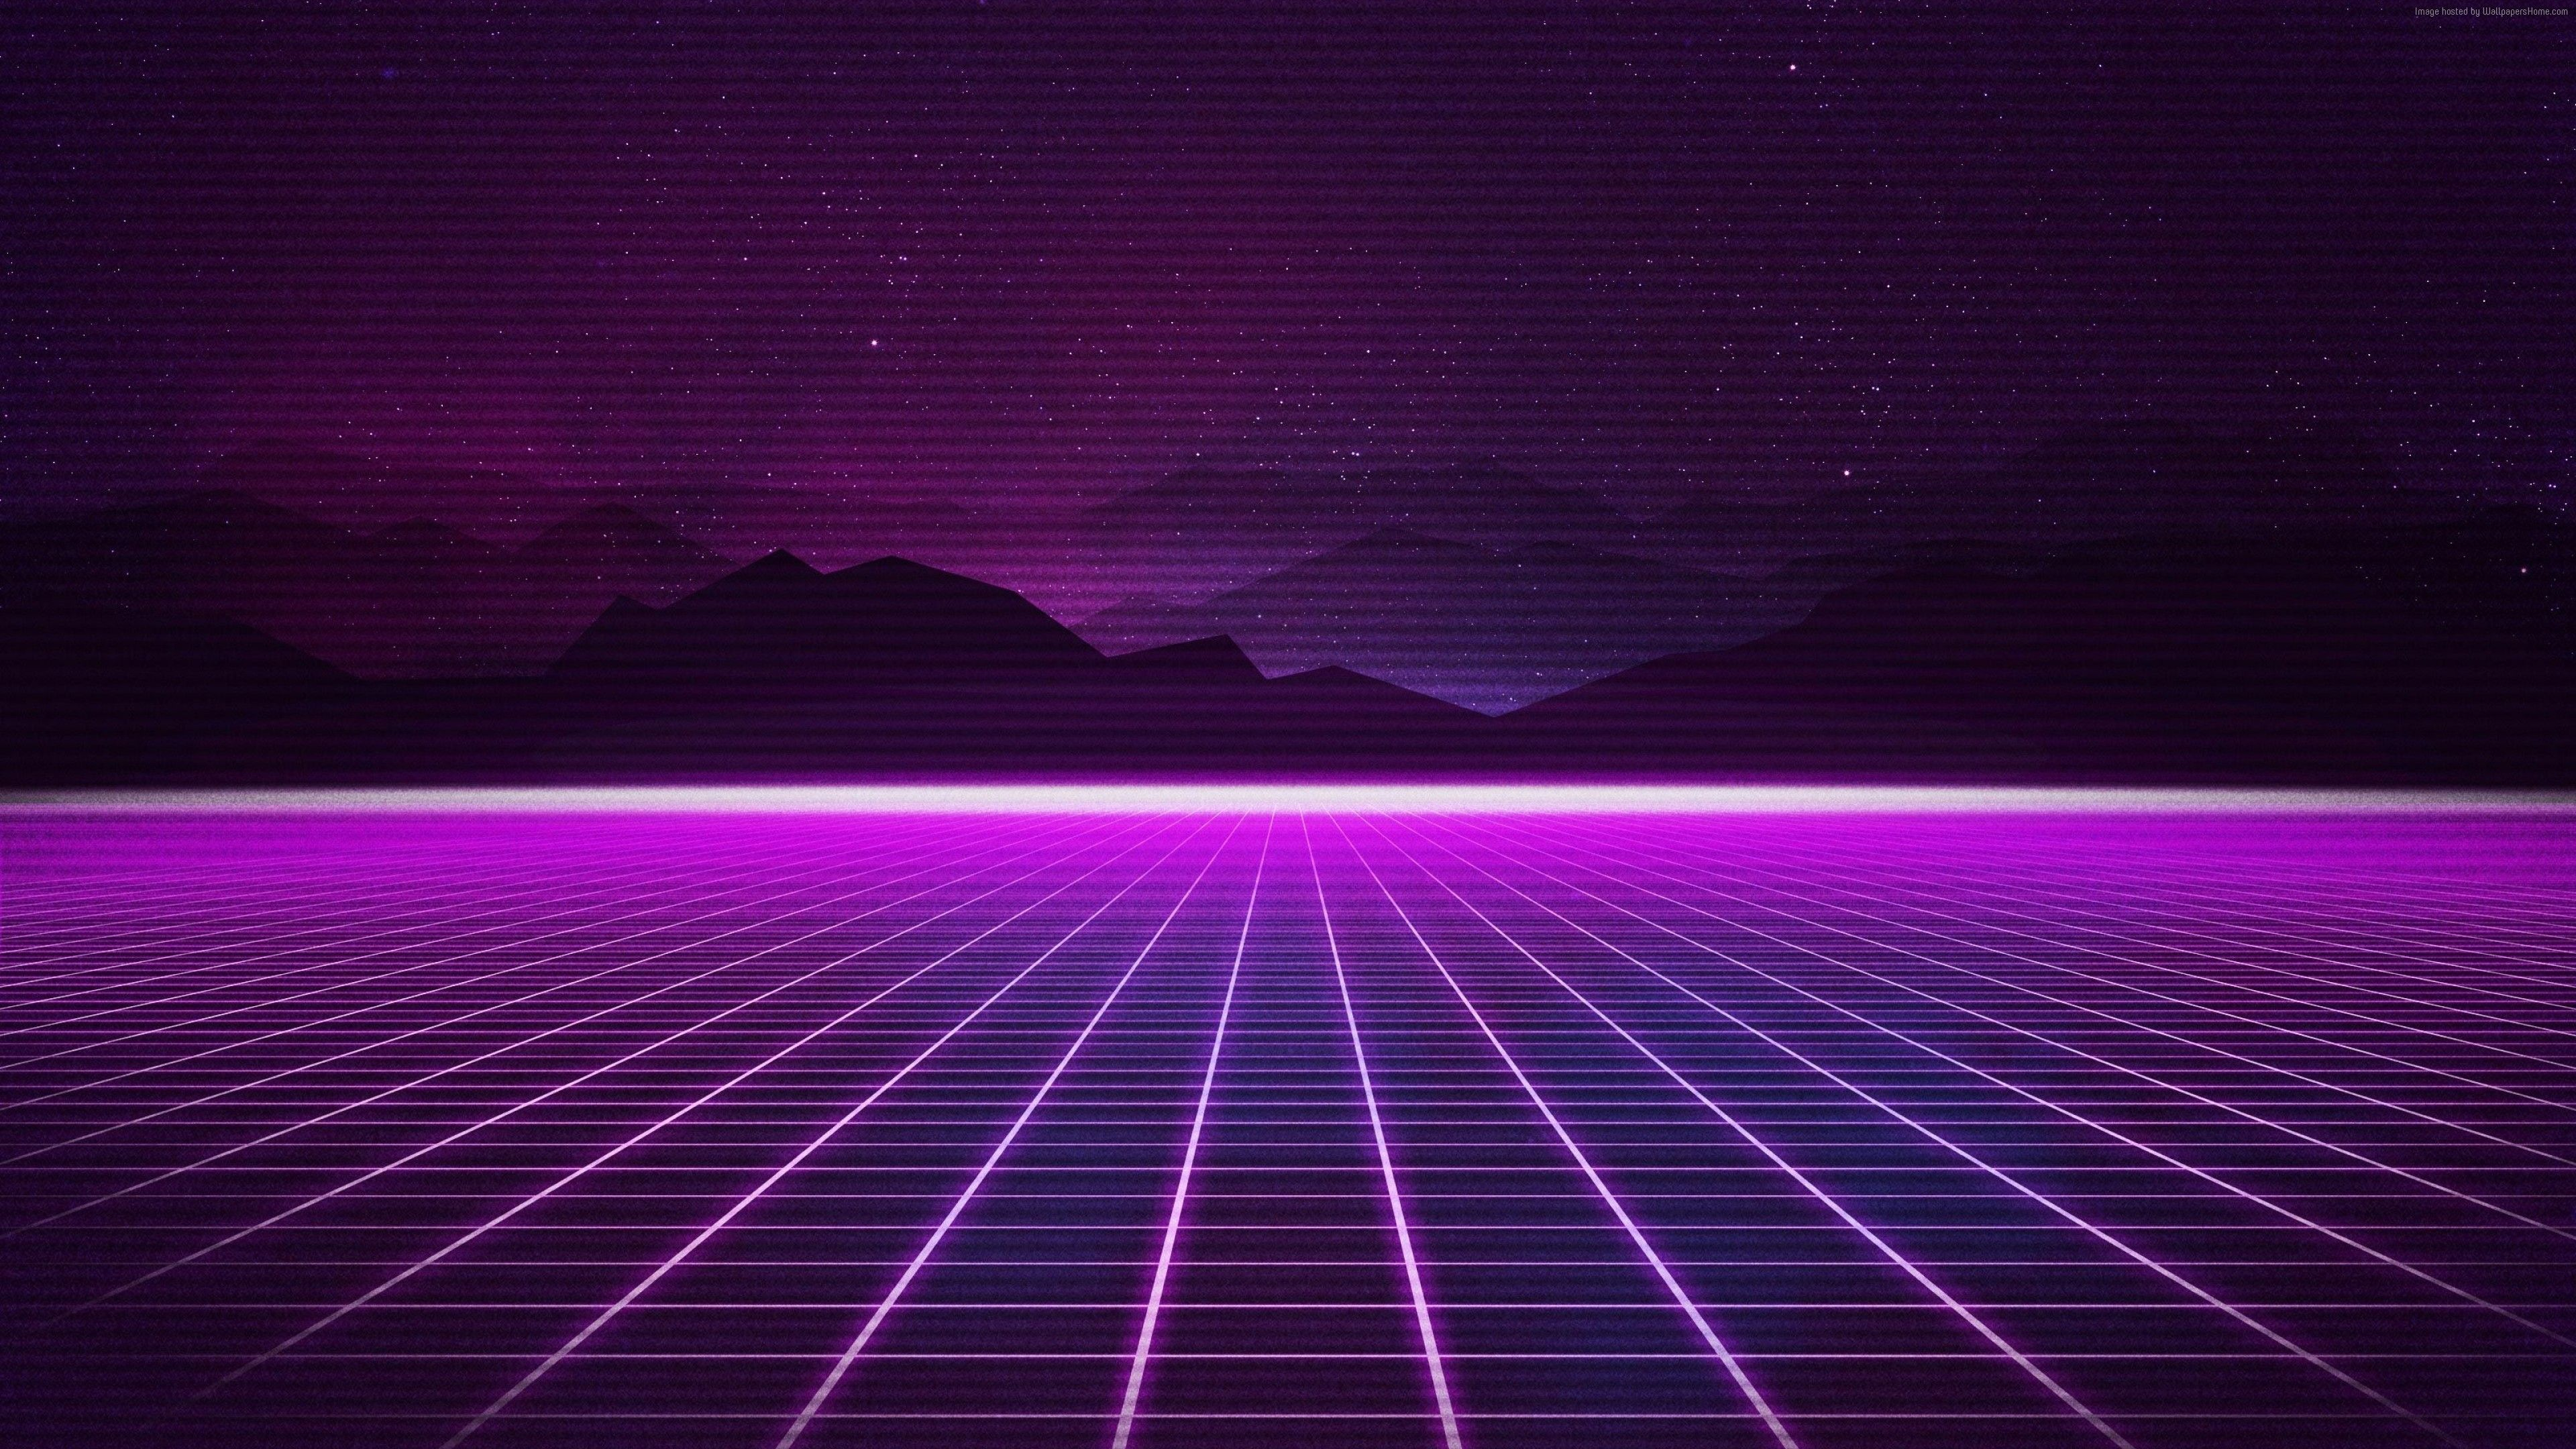 Wallpaper Retrowave Purple lines 4K Art Vaporwave wallpaper 3840x2160